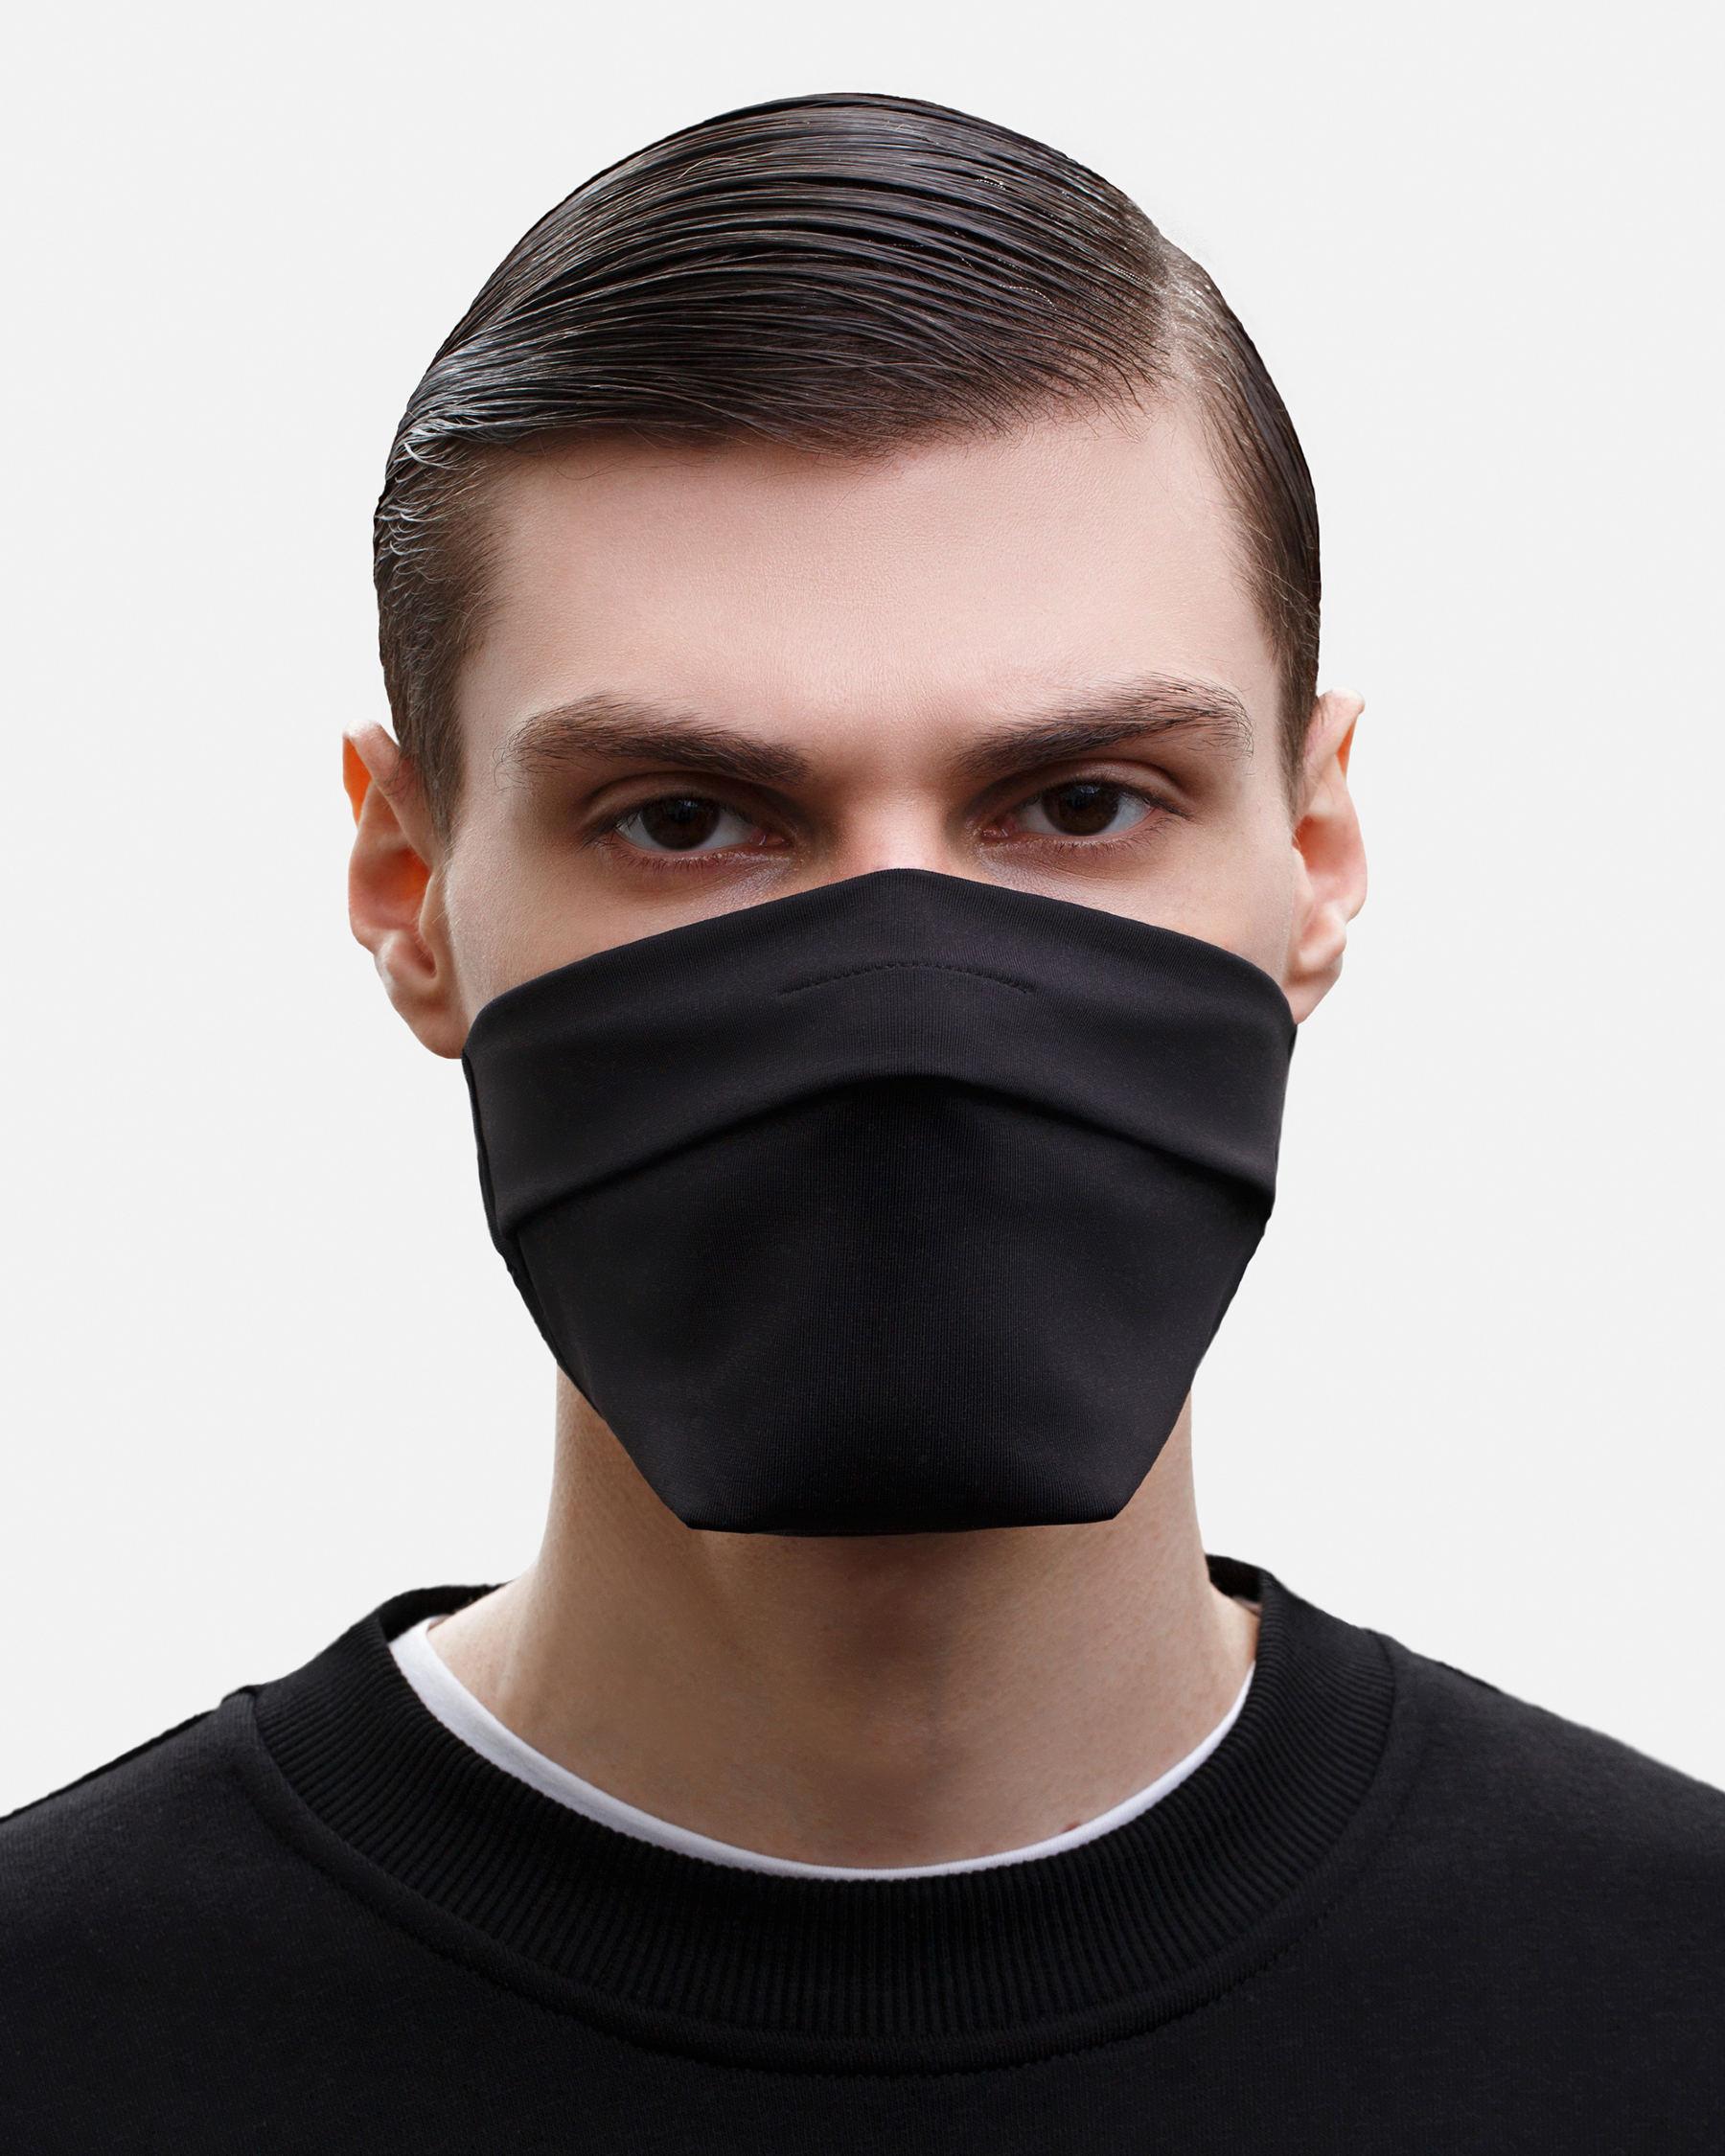 FAKBYFAK  The Vega. Ear Strap-Free High-End Protective Antibacterial (ATB-UV+) Face Mask. Black Code: FBF-42101-71